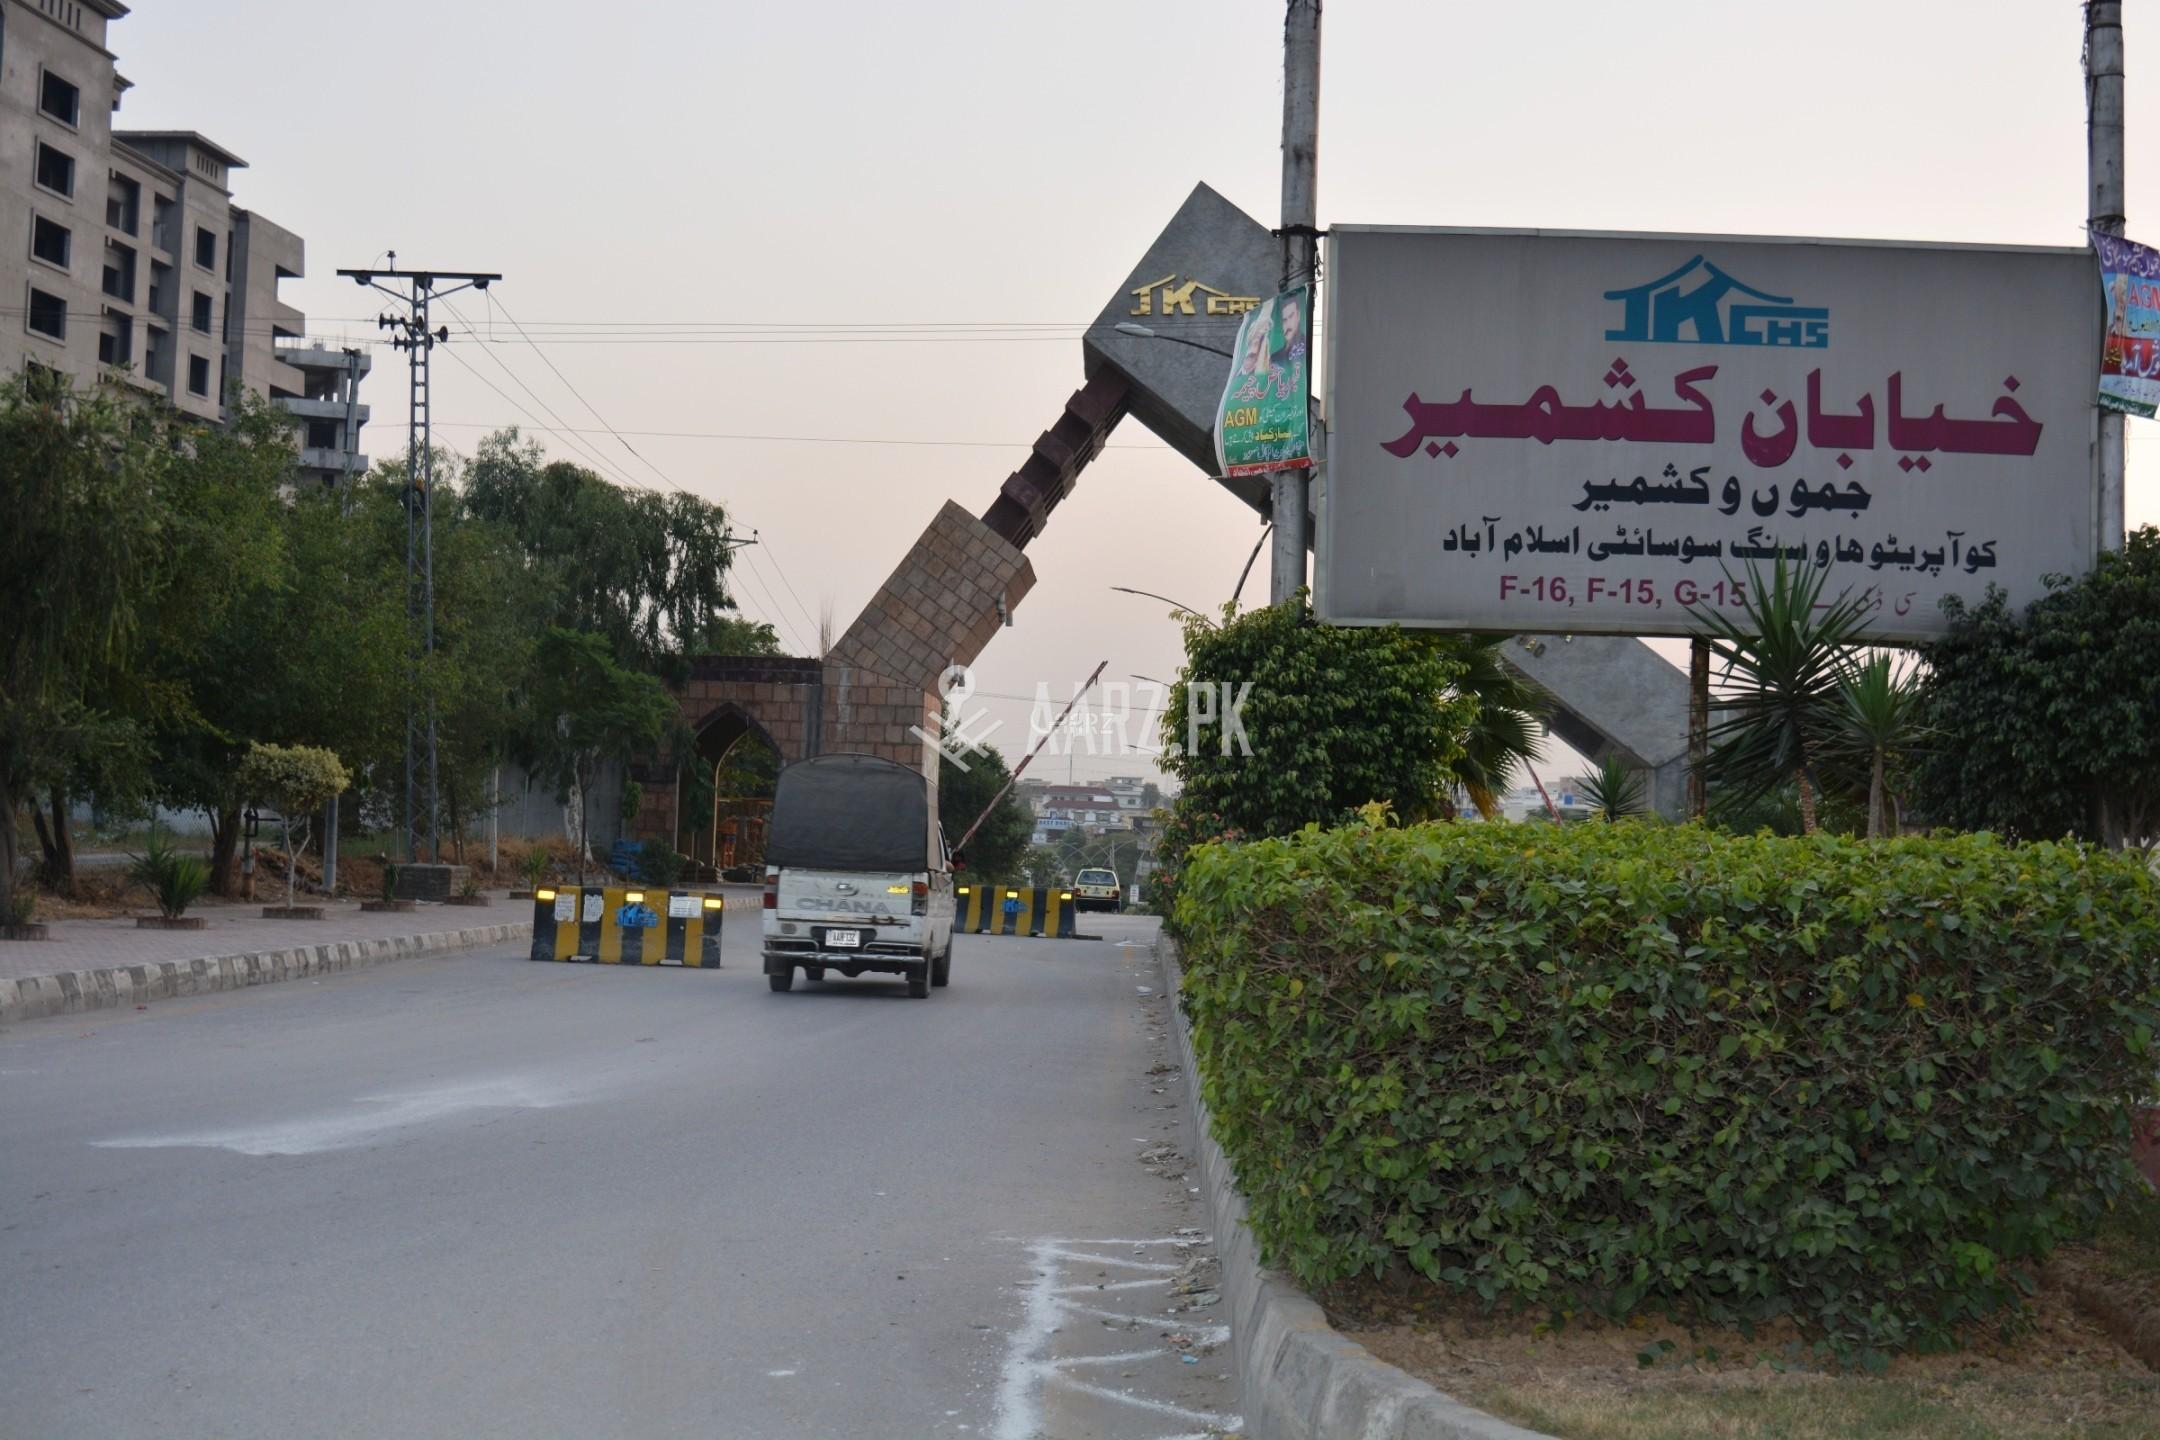 10 Marla Plot for Sale in F-15/1 Islamabad - AARZ.PK